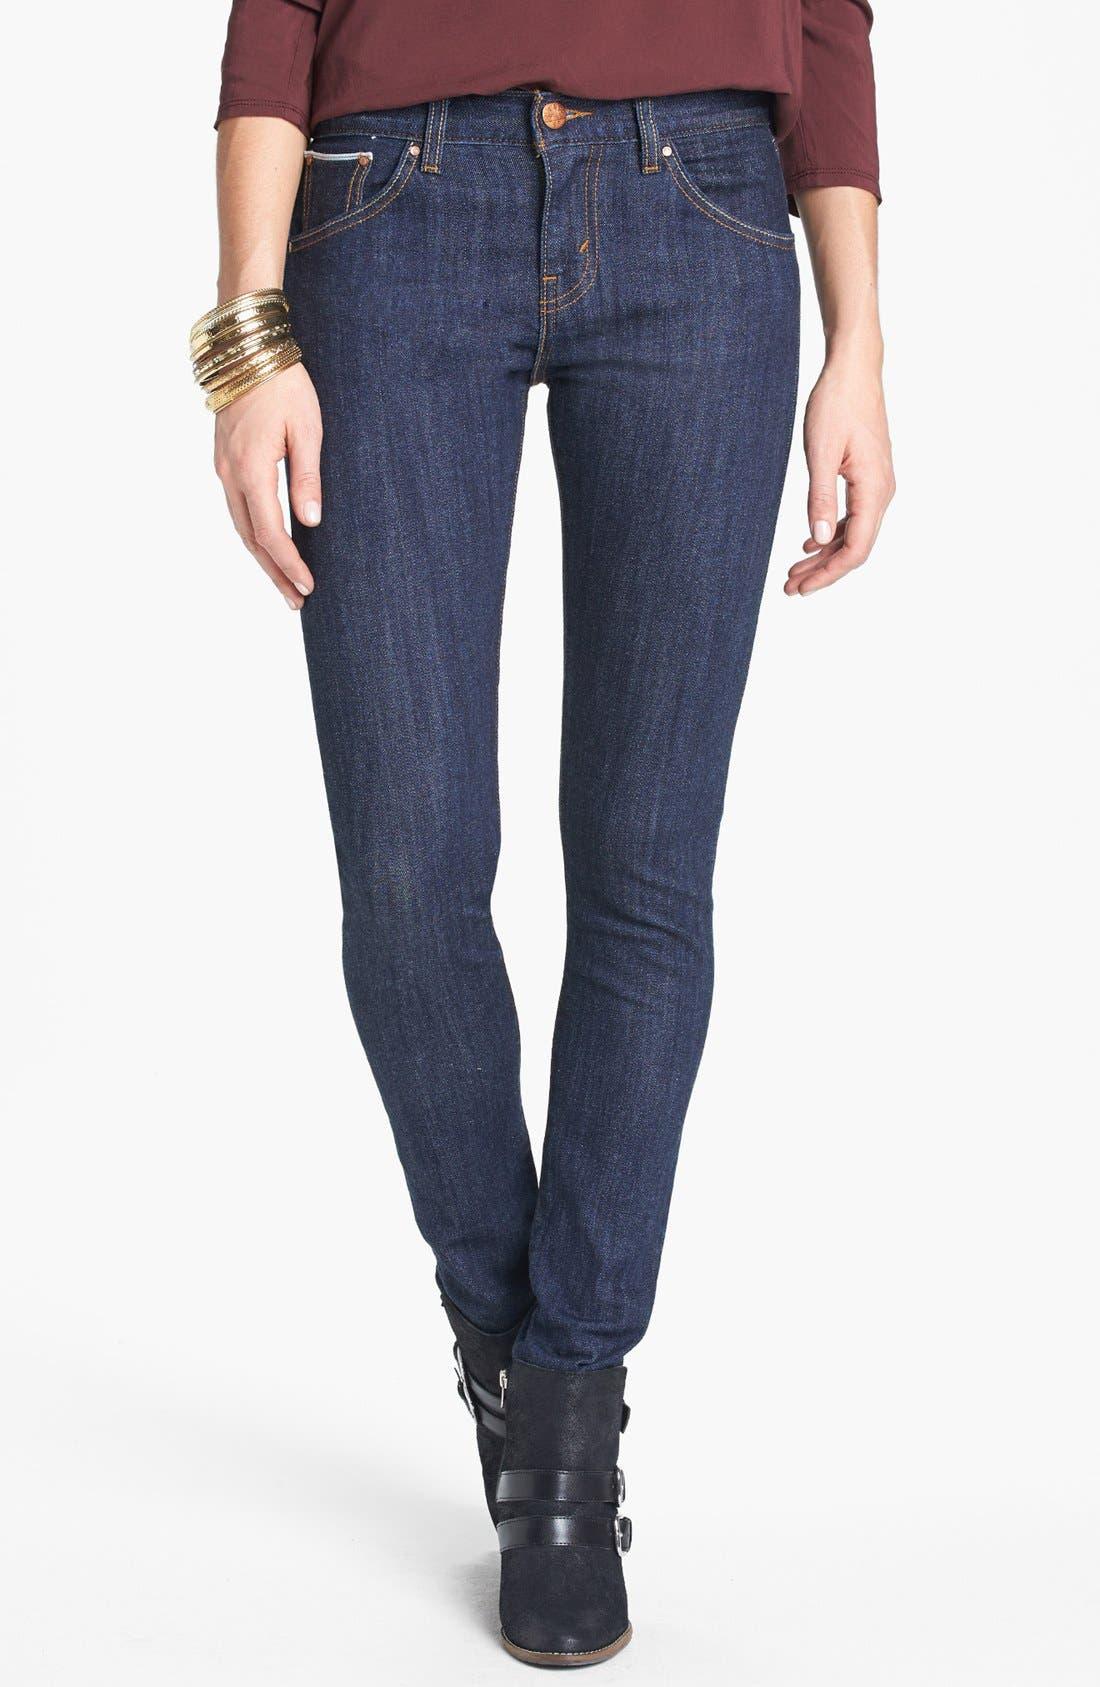 Alternate Image 1 Selected - Levi's® High Waist Resin Rinse Selvedge Skinny Jeans